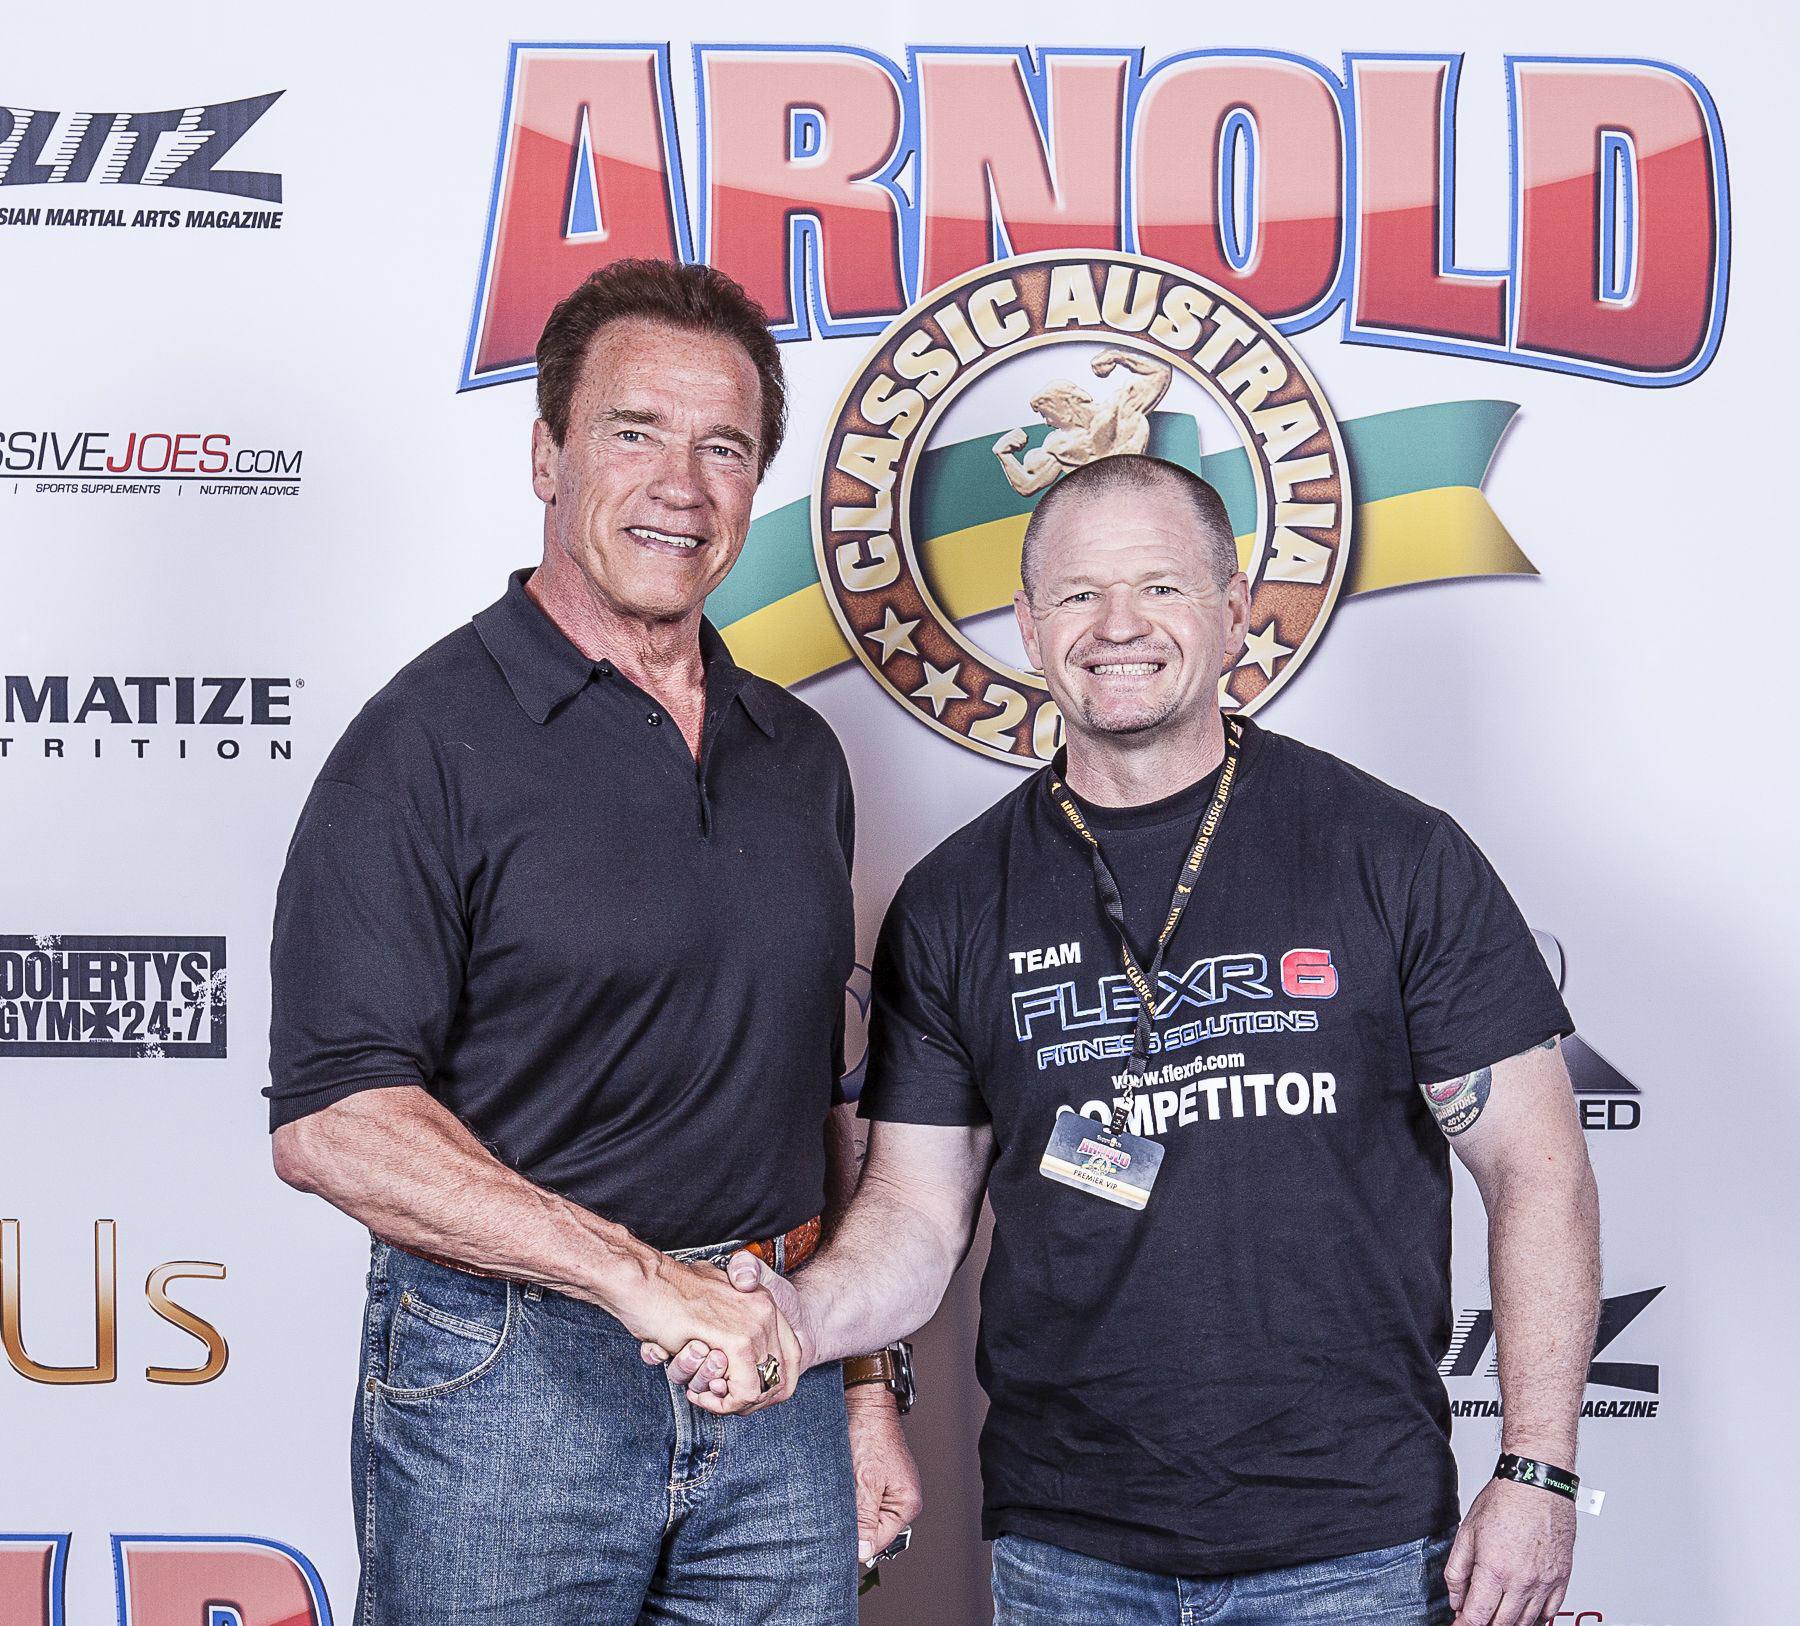 Arnold Schwarzenegger Flexr6 Ken Ross